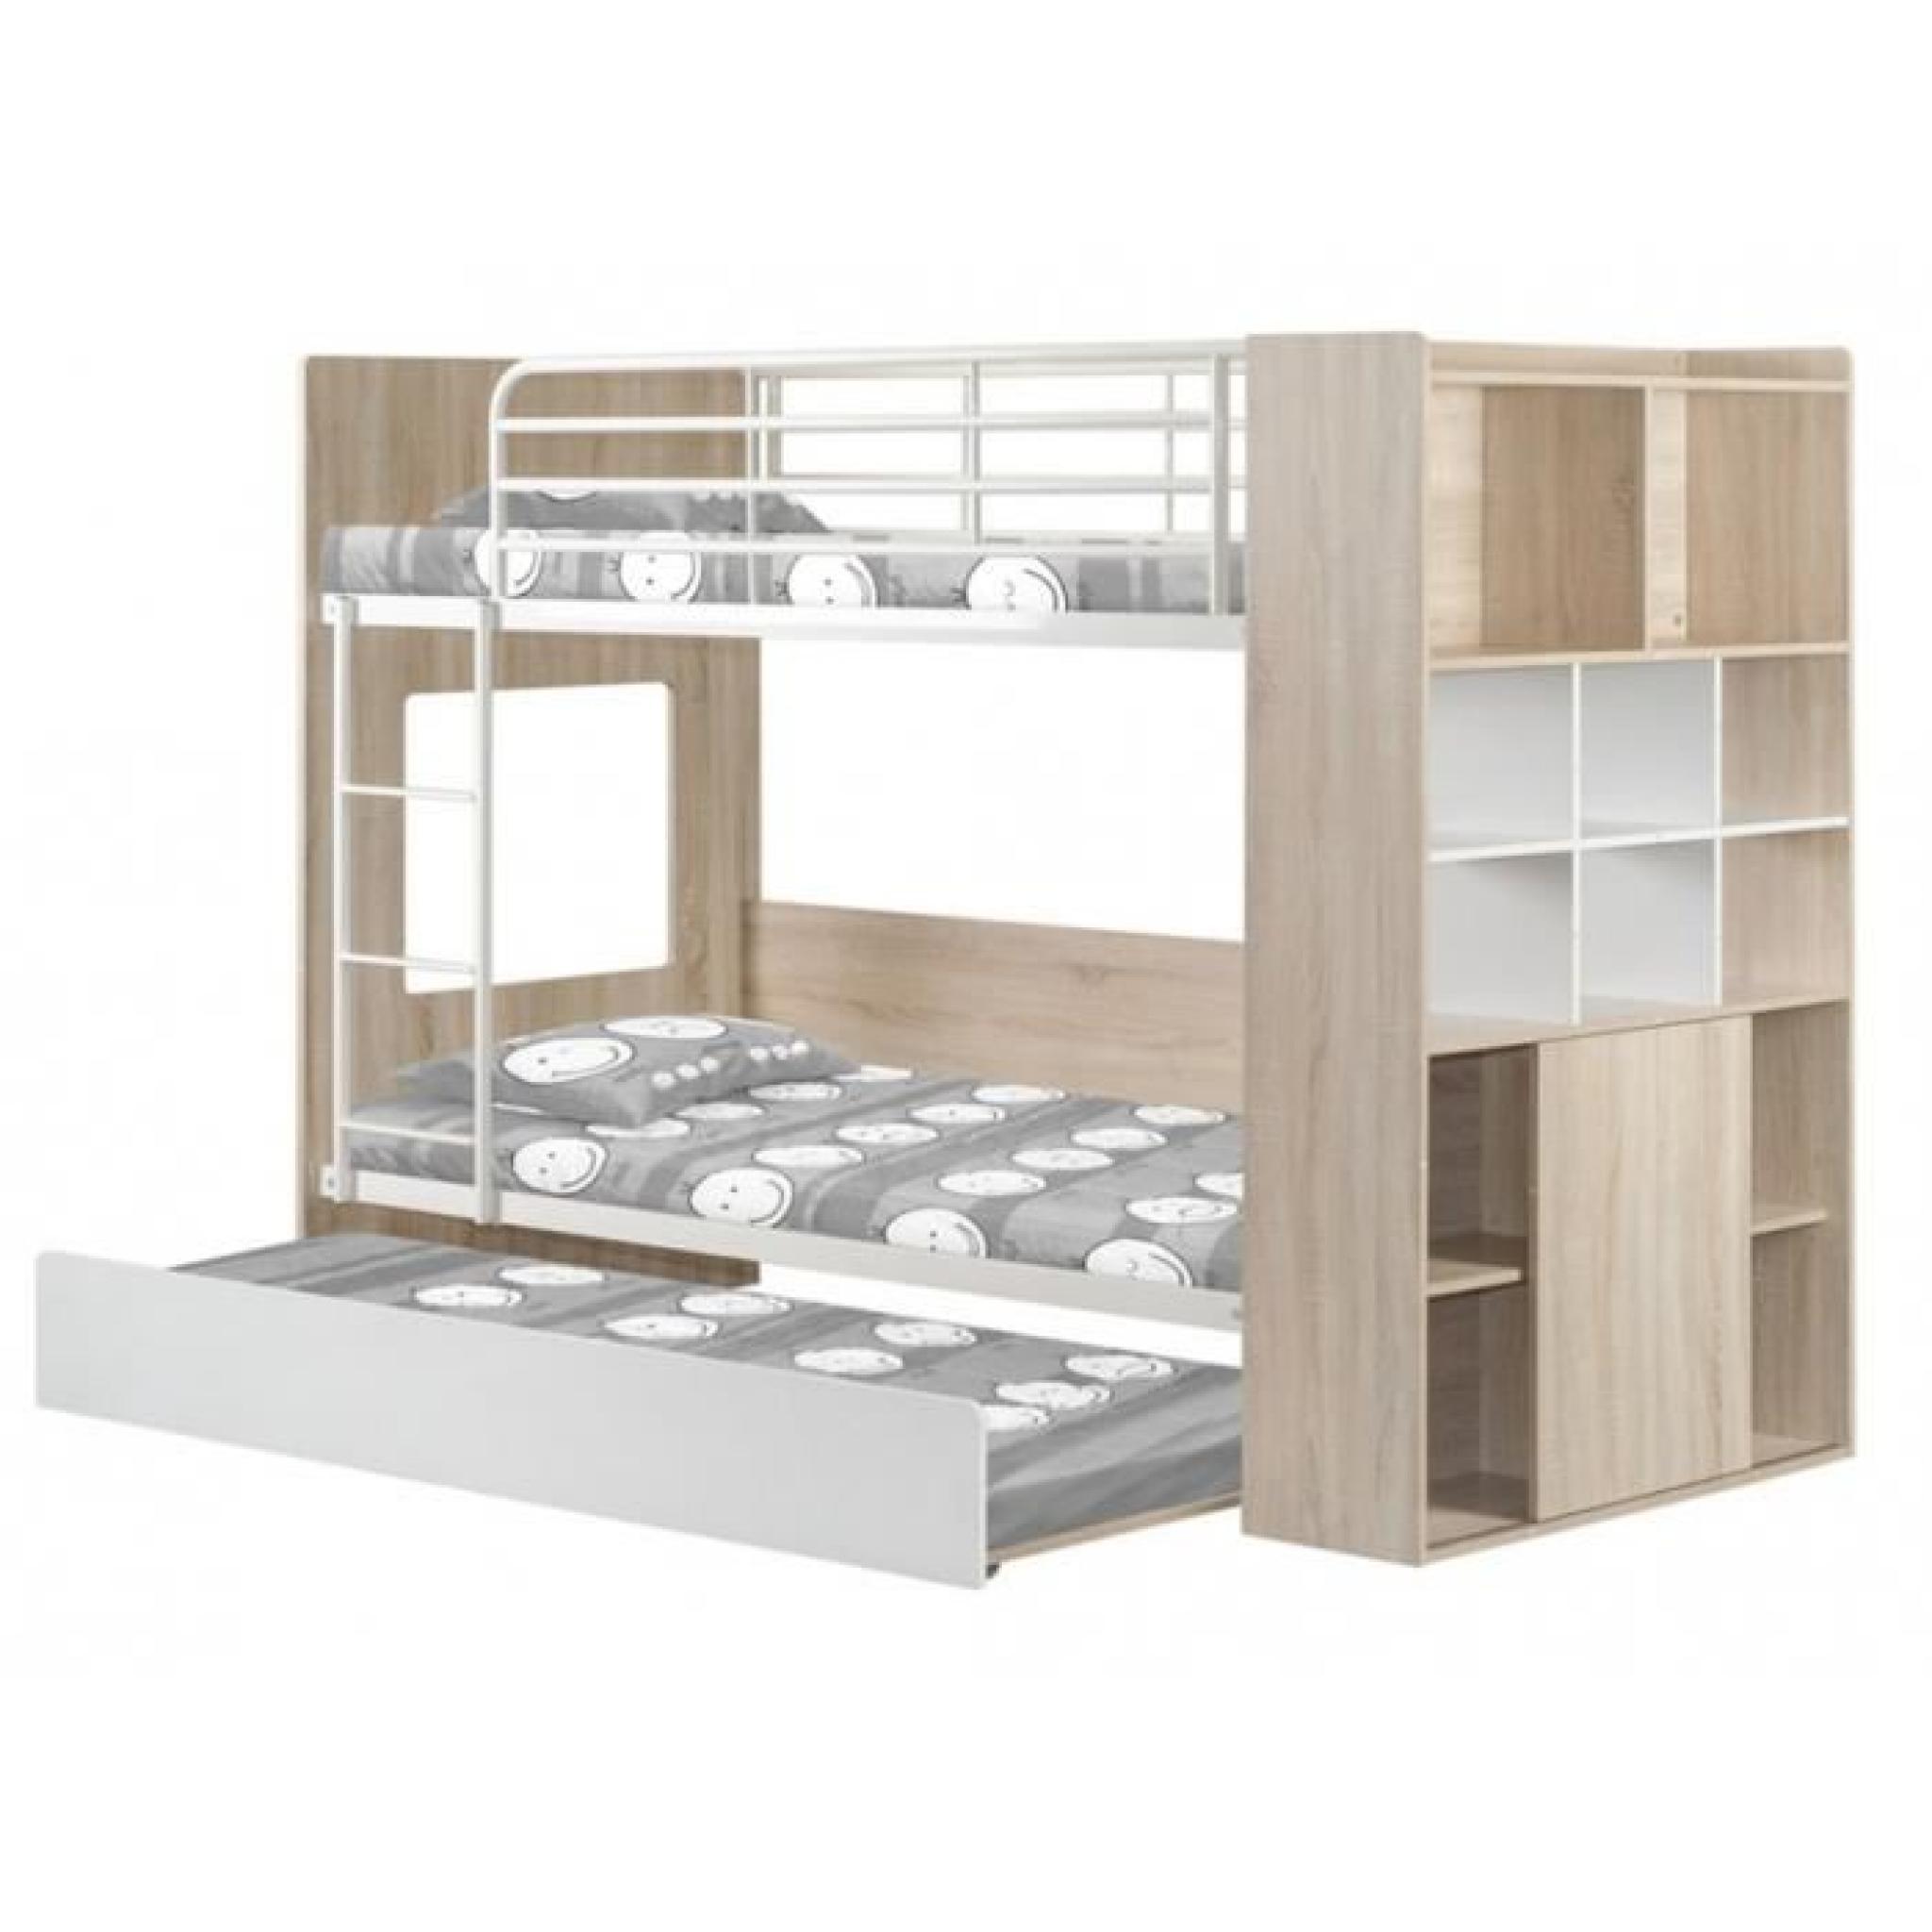 lits superpos s marcus avec lit gigogne etag res. Black Bedroom Furniture Sets. Home Design Ideas